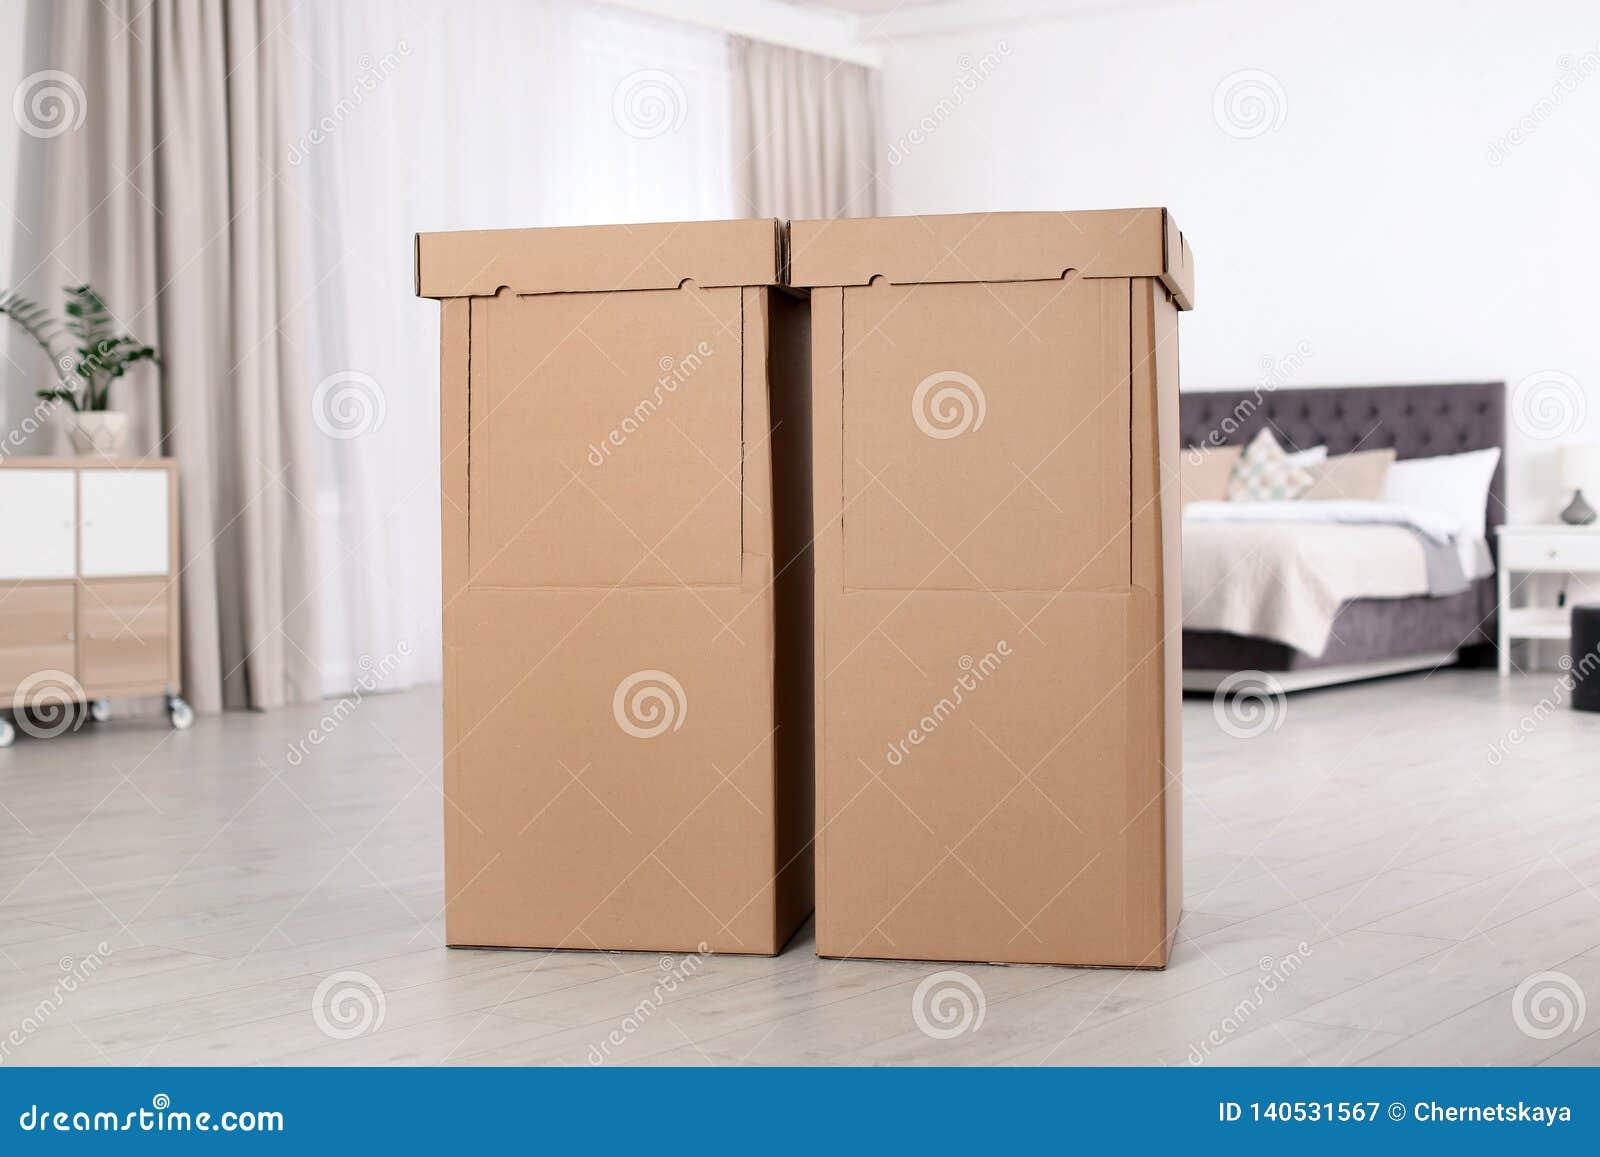 Cardboard Wardrobe Boxes In Bedroom Stock Image Image Of